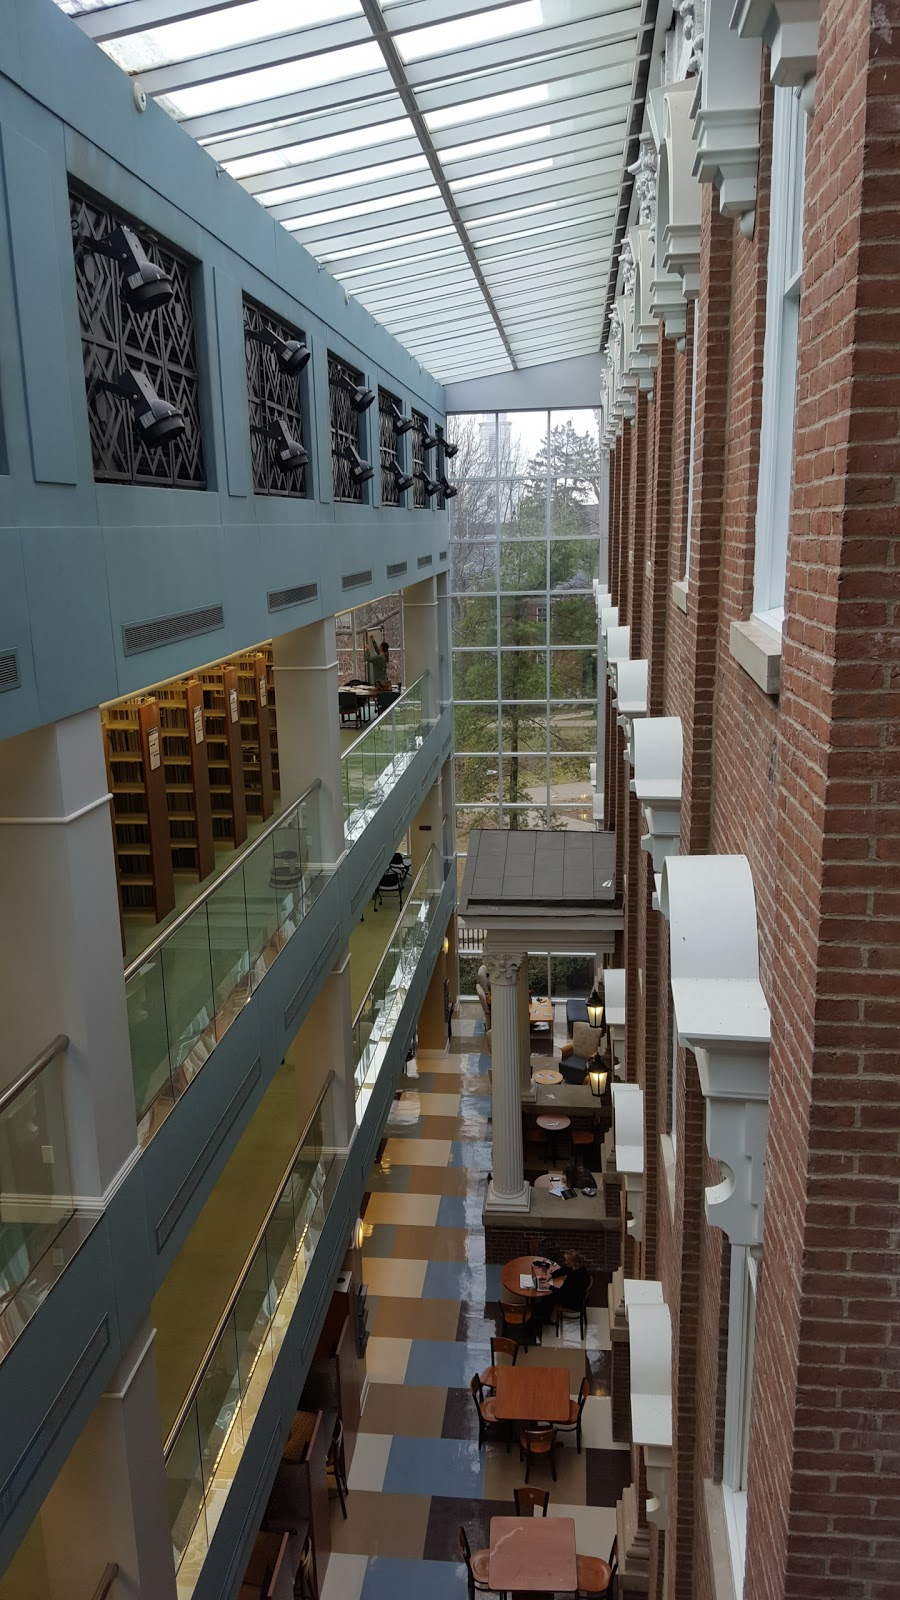 Eastern Kentucky University Libraries - library  | Photo 9 of 10 | Address: 583 University Dr, Richmond, KY 40475, USA | Phone: (859) 622-1790